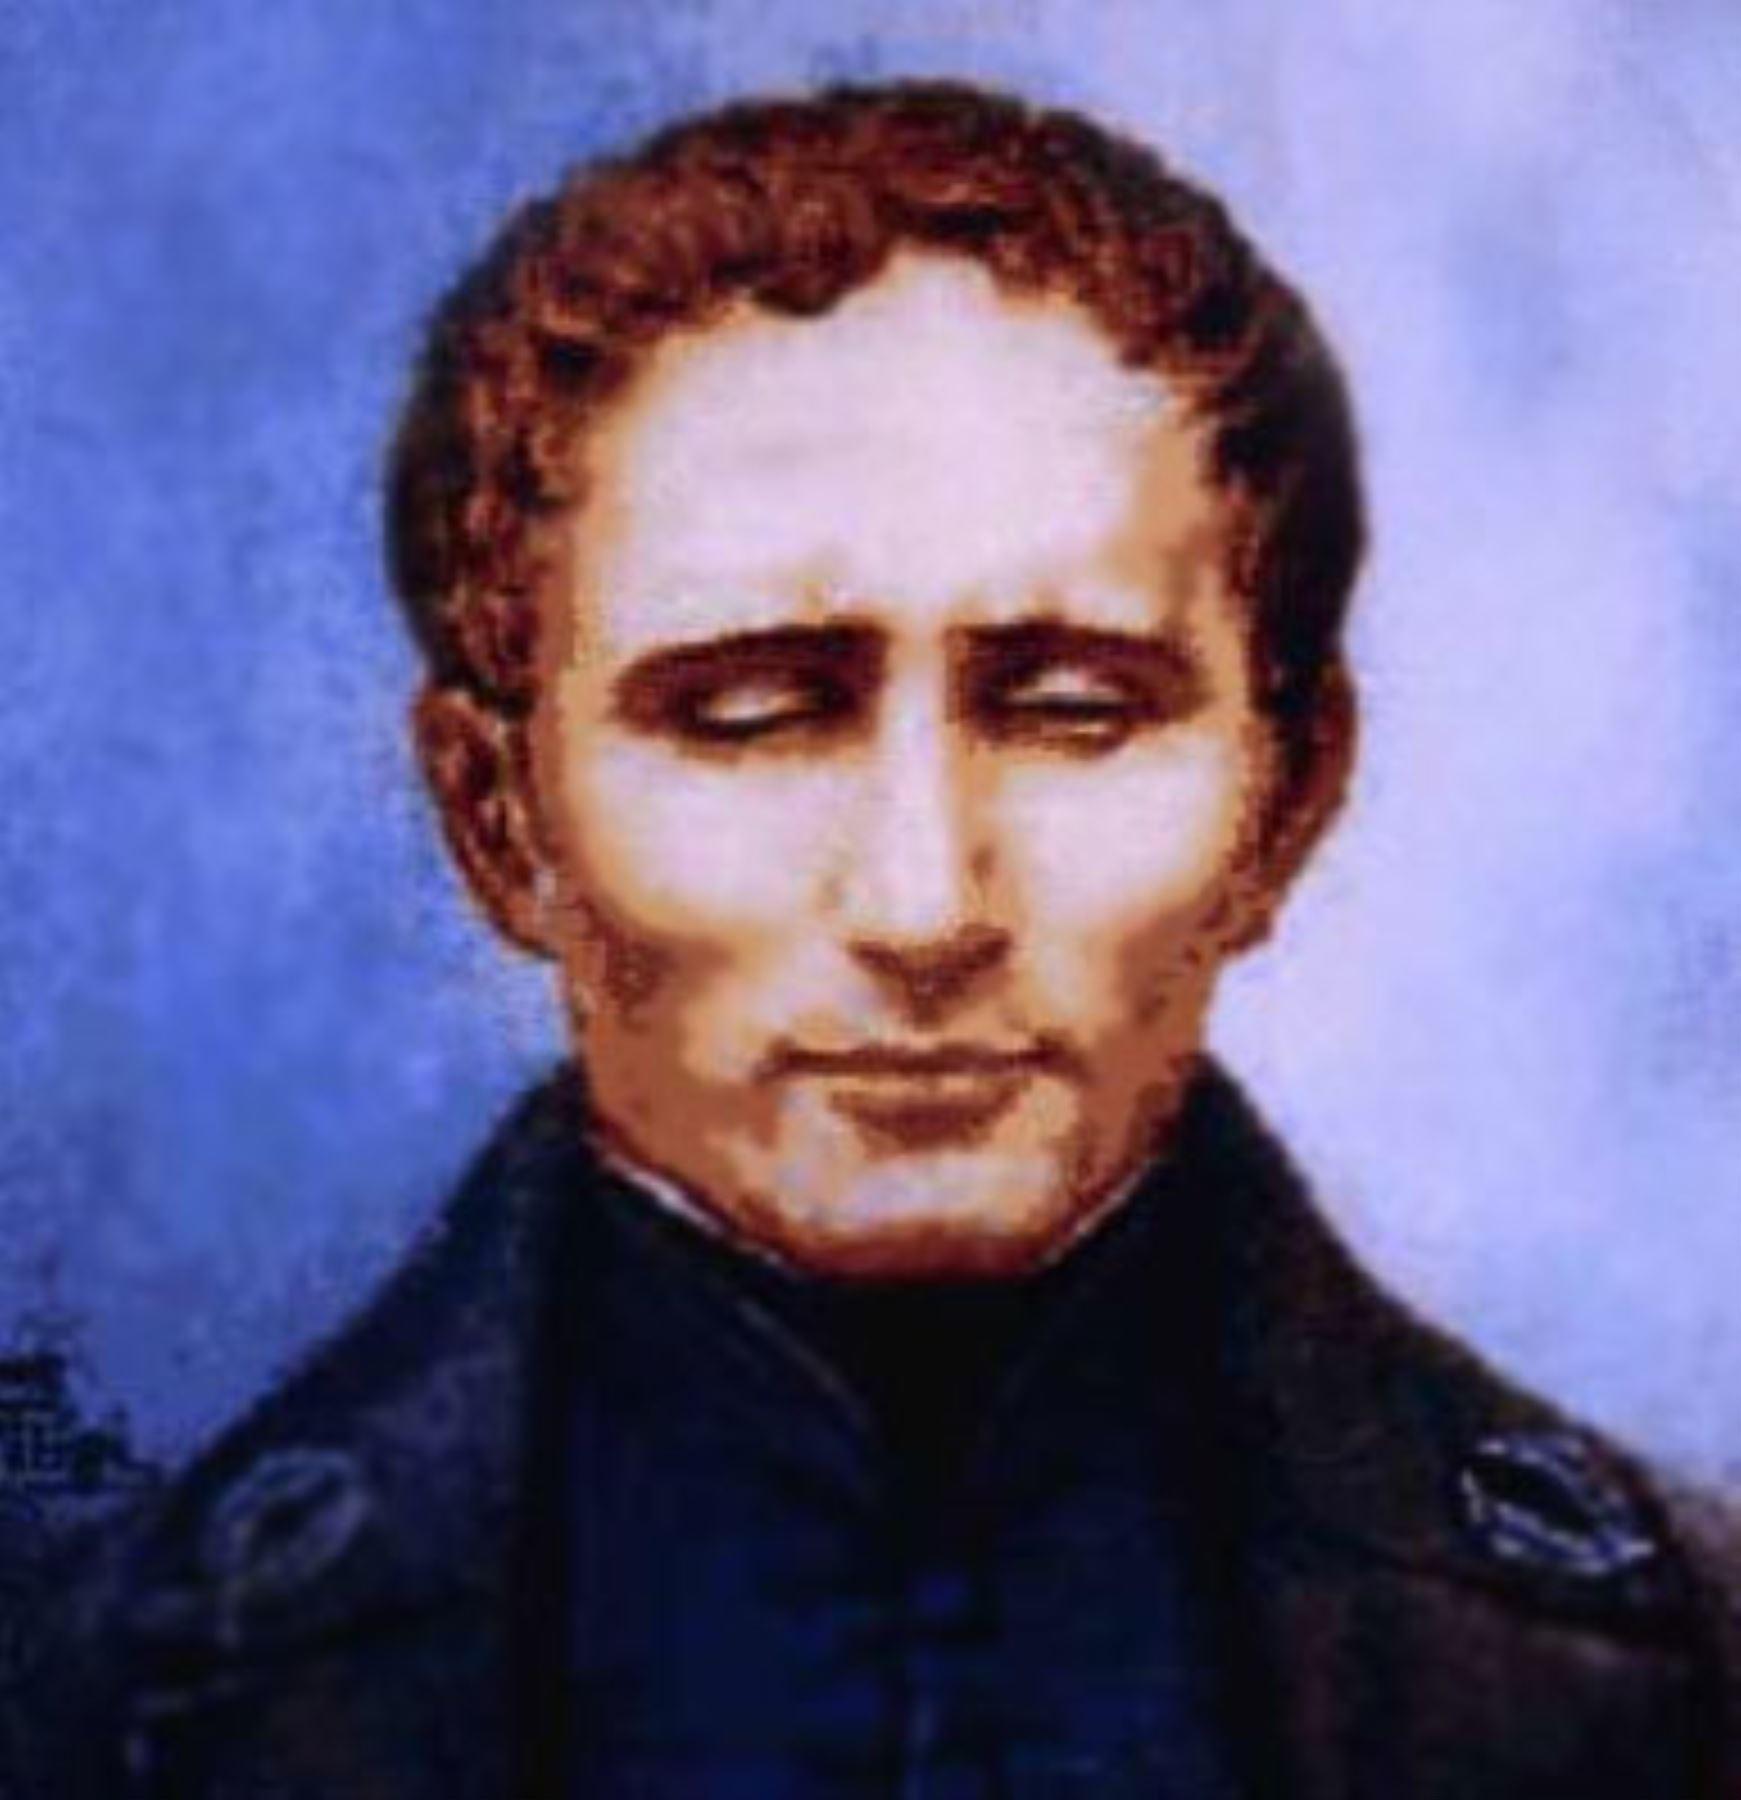 Em 1829, Louis Braille apromorou o sistema de escrita noturna e criou o Sistema Braille